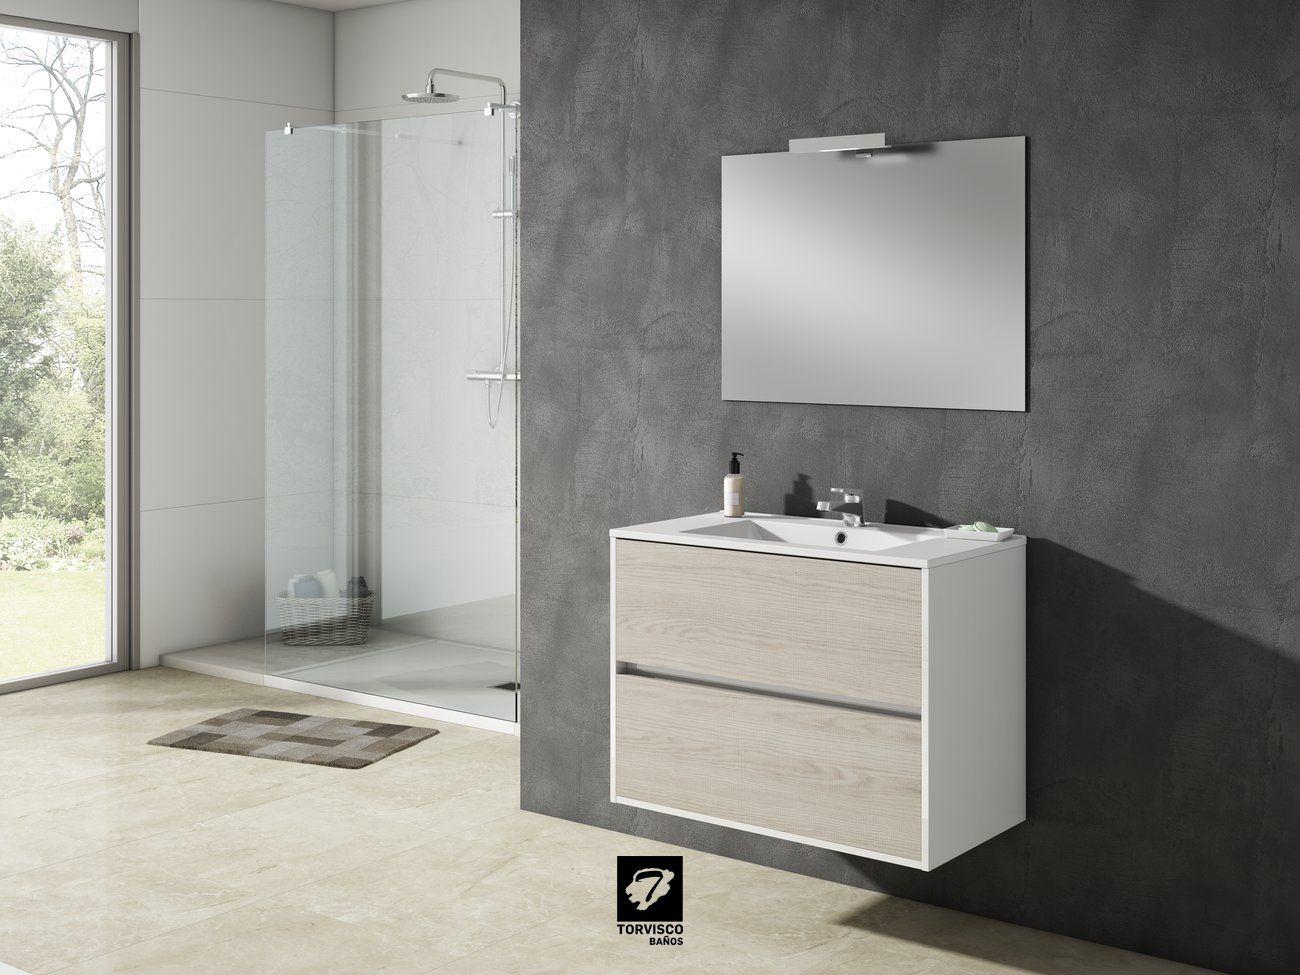 Mueble de baño modelo TAIGA. 80cm de ancho y 45cm de fondo ...